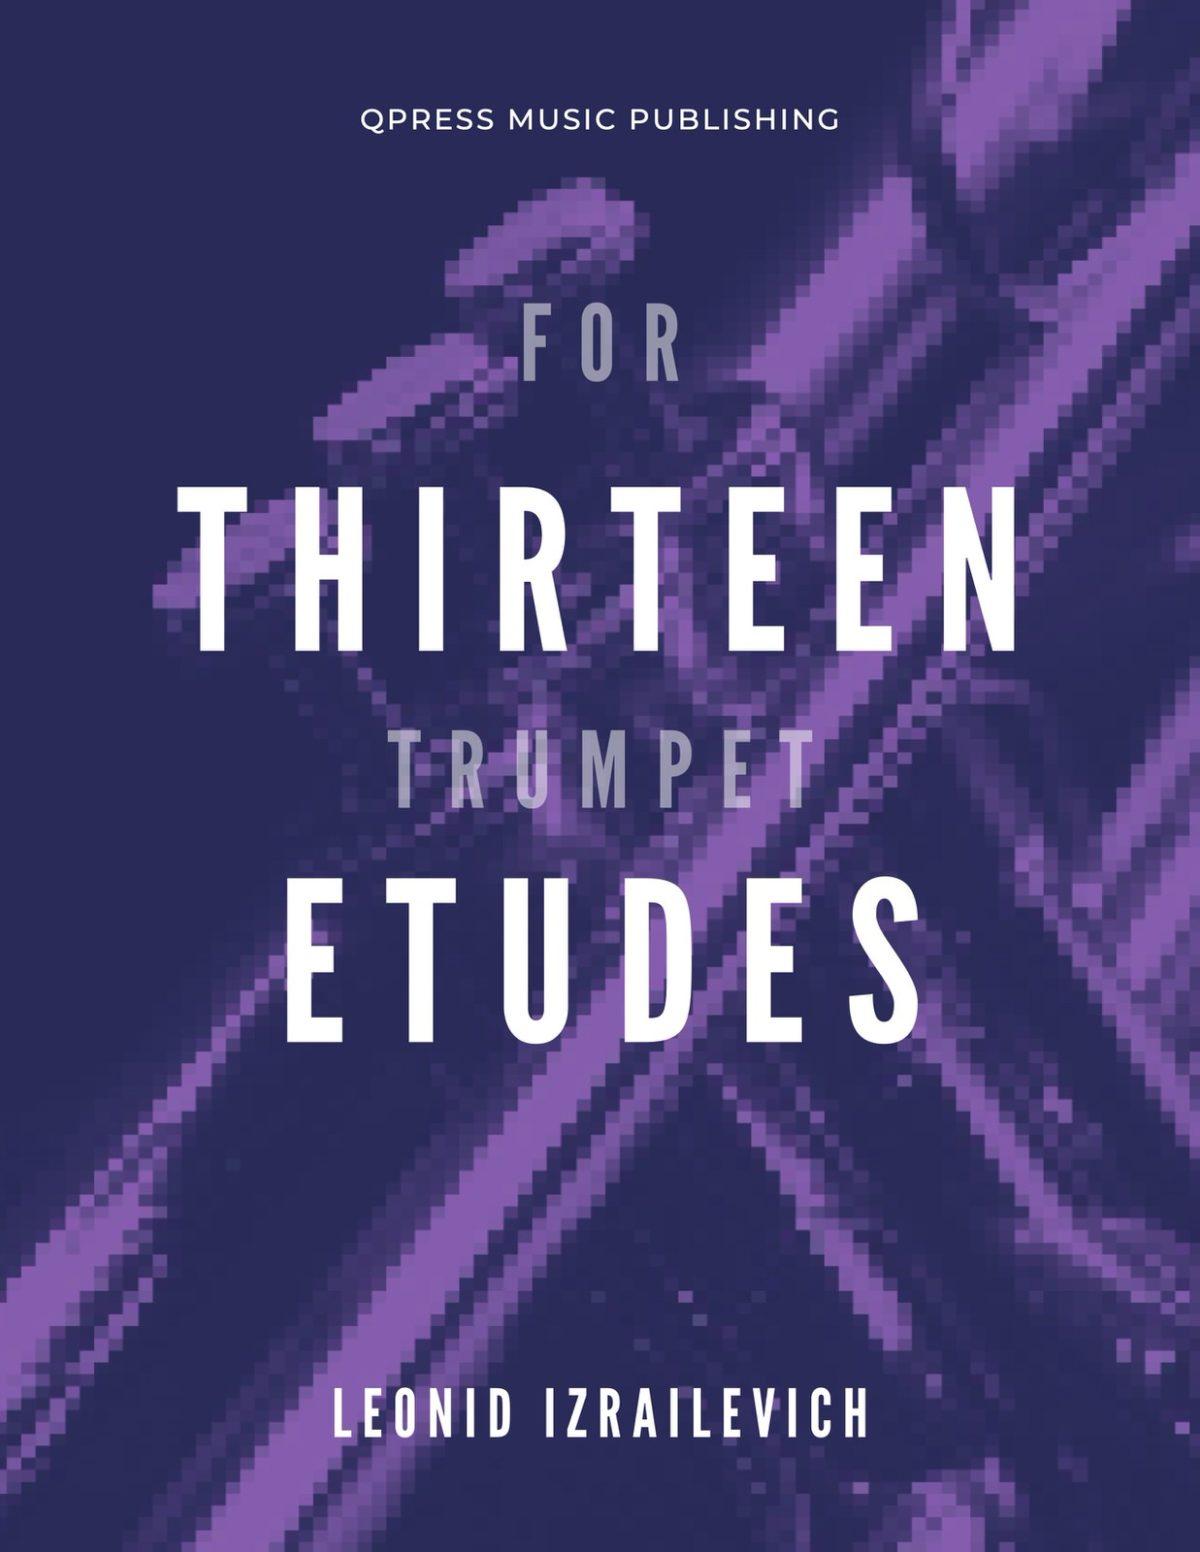 Izrailevich, Leonid, 13 Etudes for Trumpet